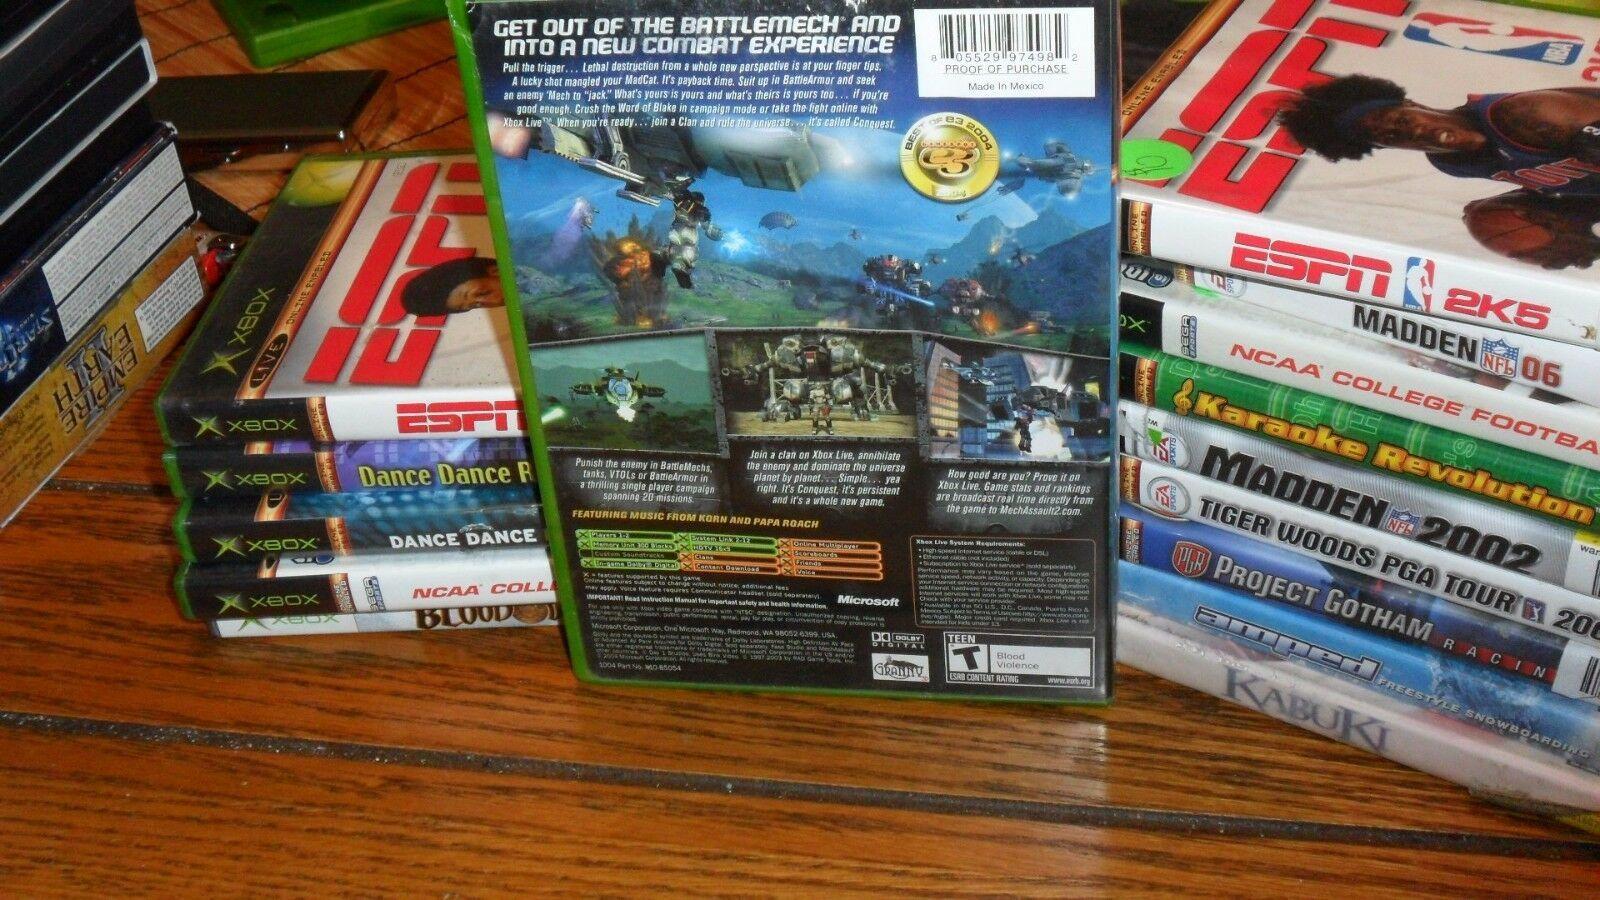 MechAssault 2: Lone Wolf (Microsoft Xbox, 2004)